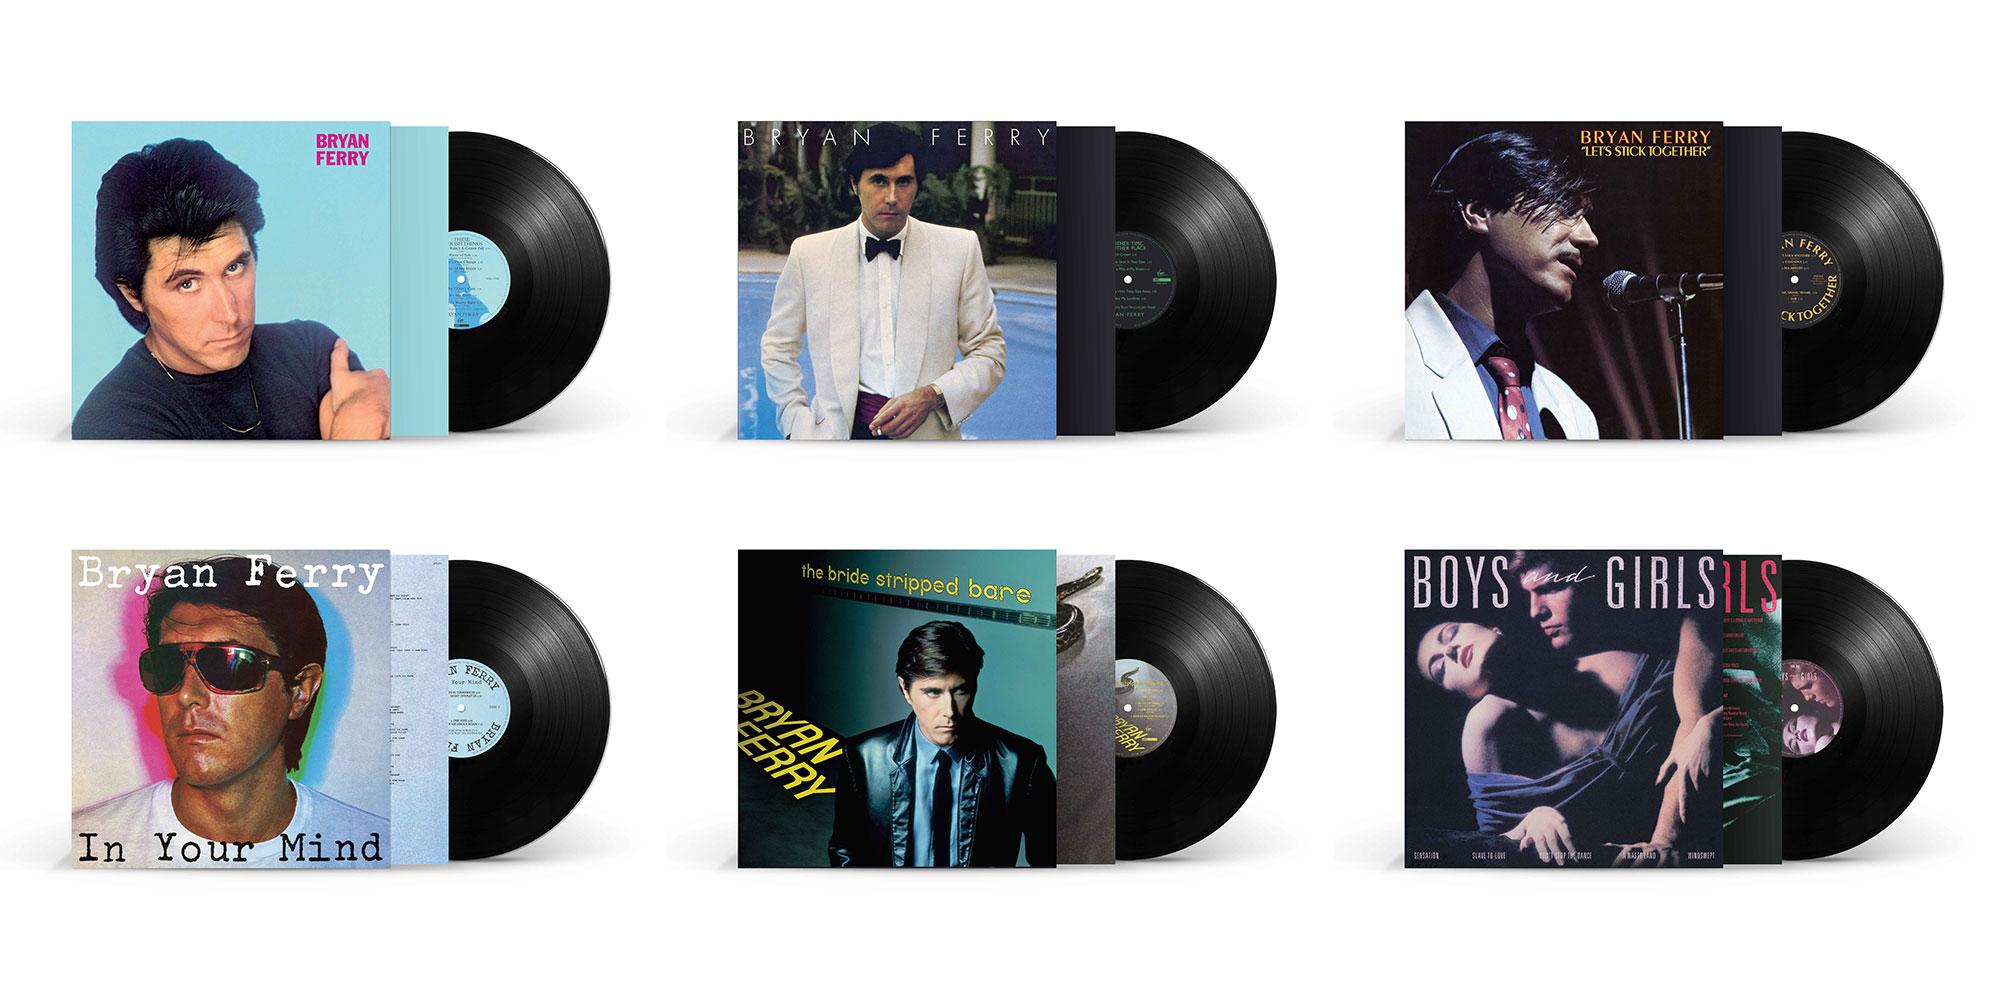 First 6 Bryan Ferry albums Remastered on Vinyl